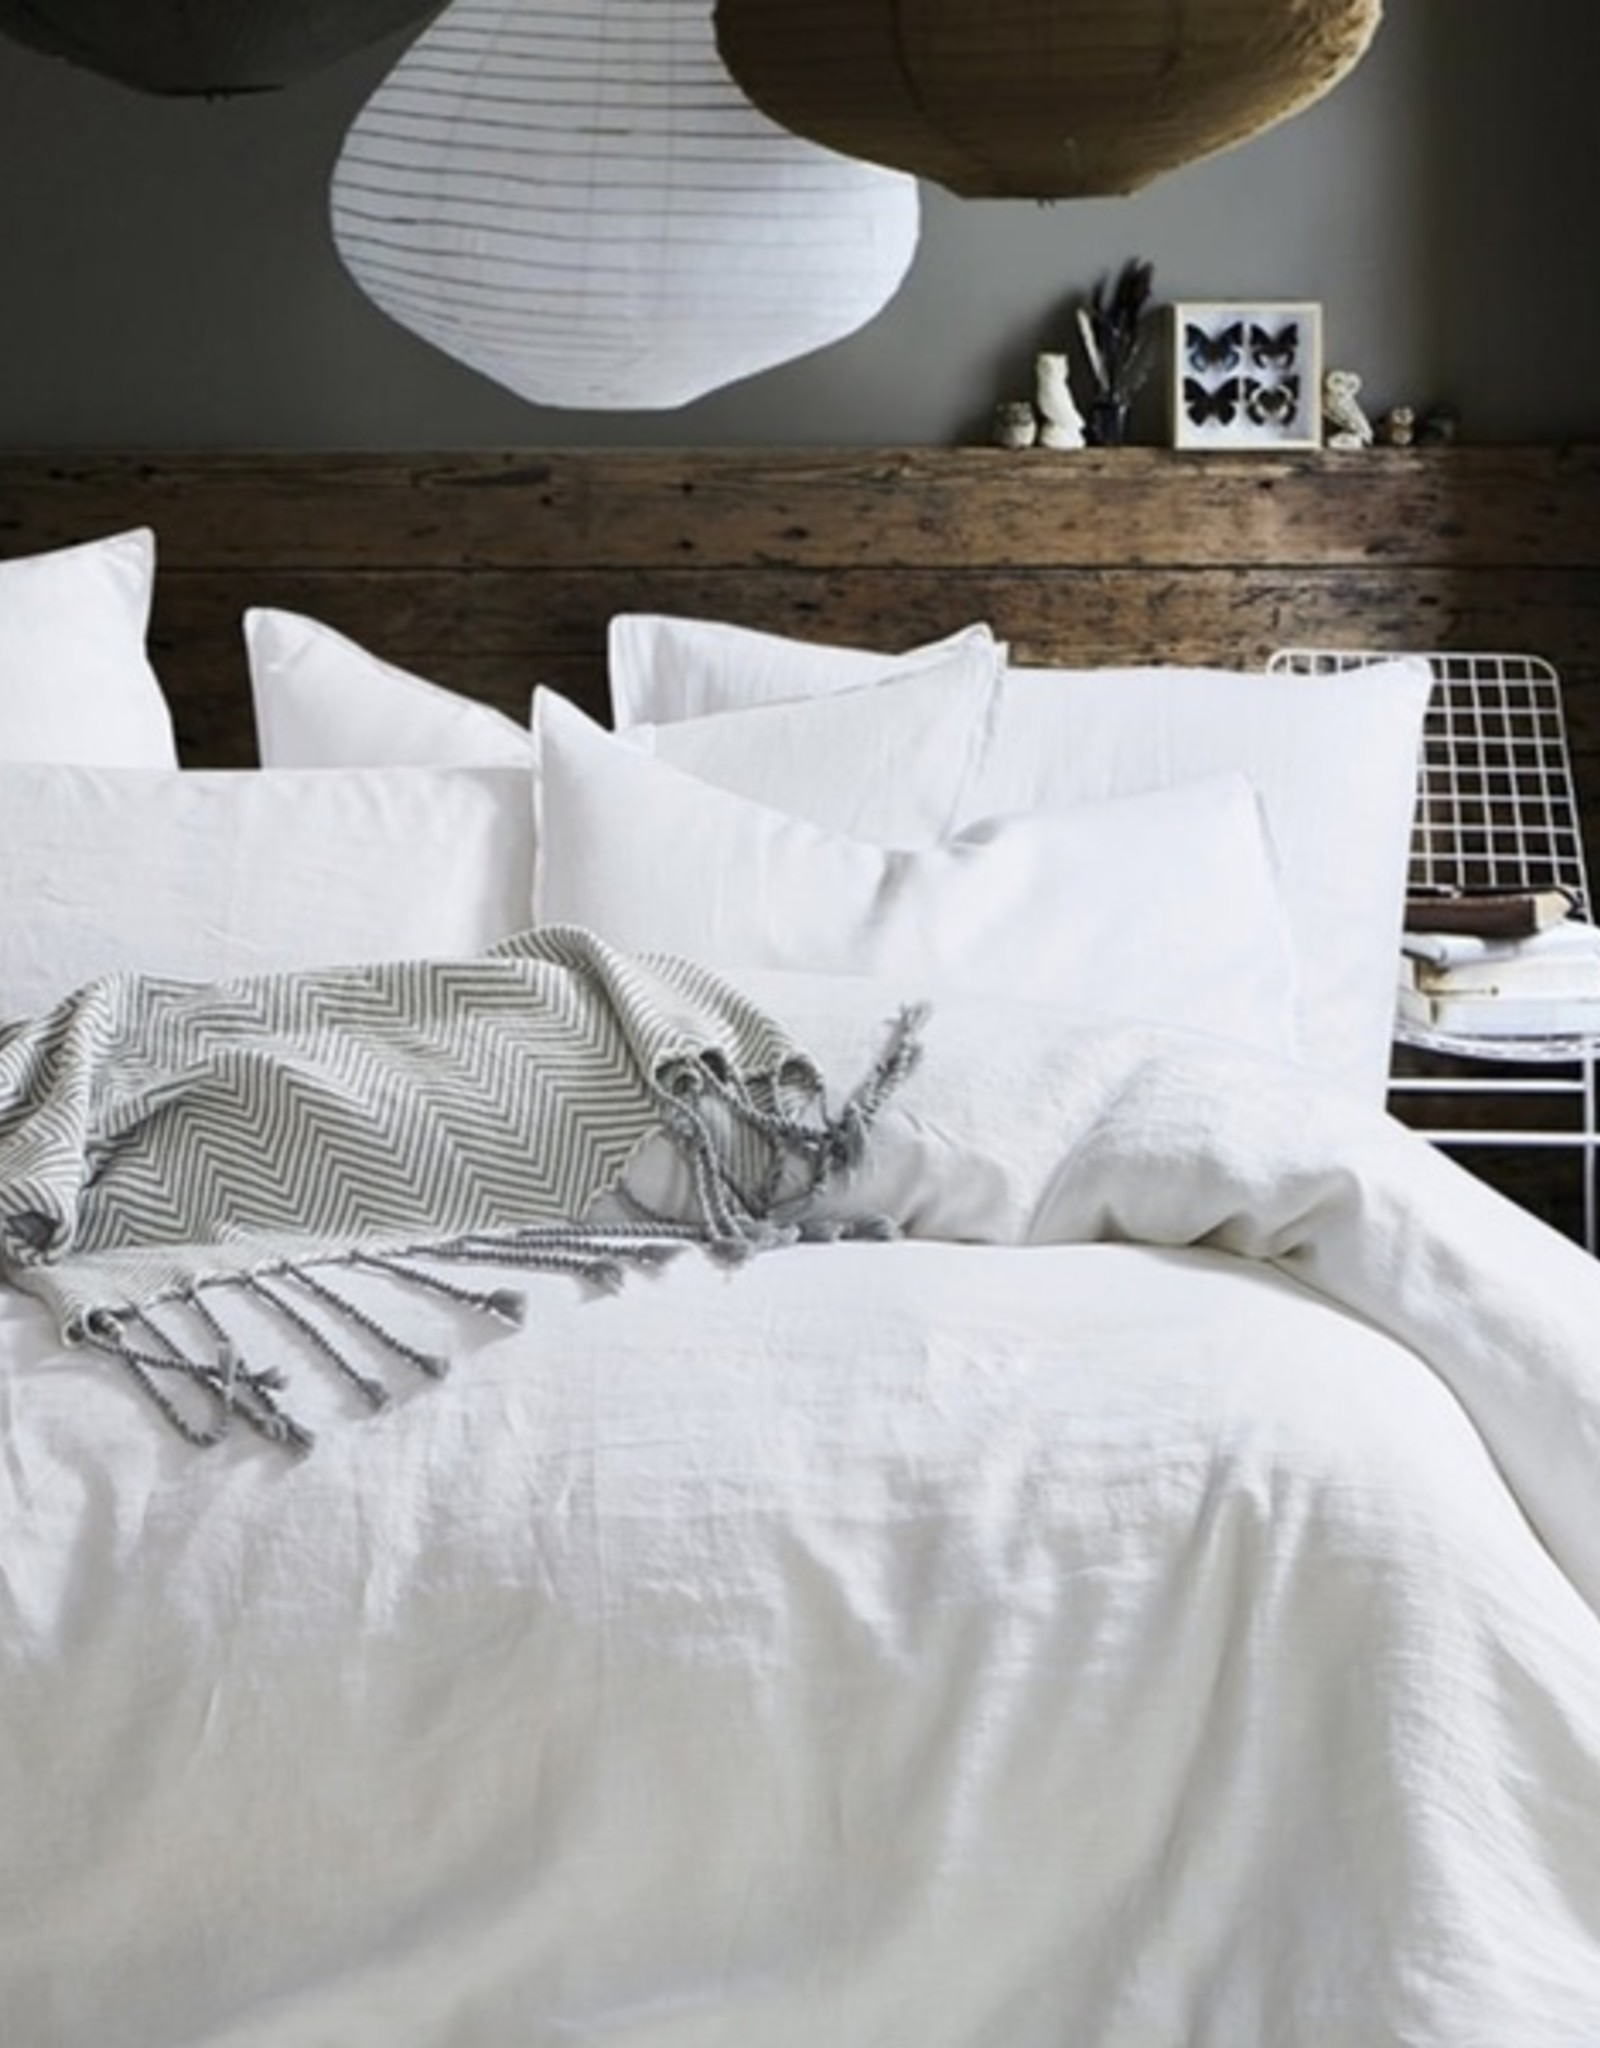 Daniadown Duvet Set Daniadown Star White Linen Queen w / Pillow Cases